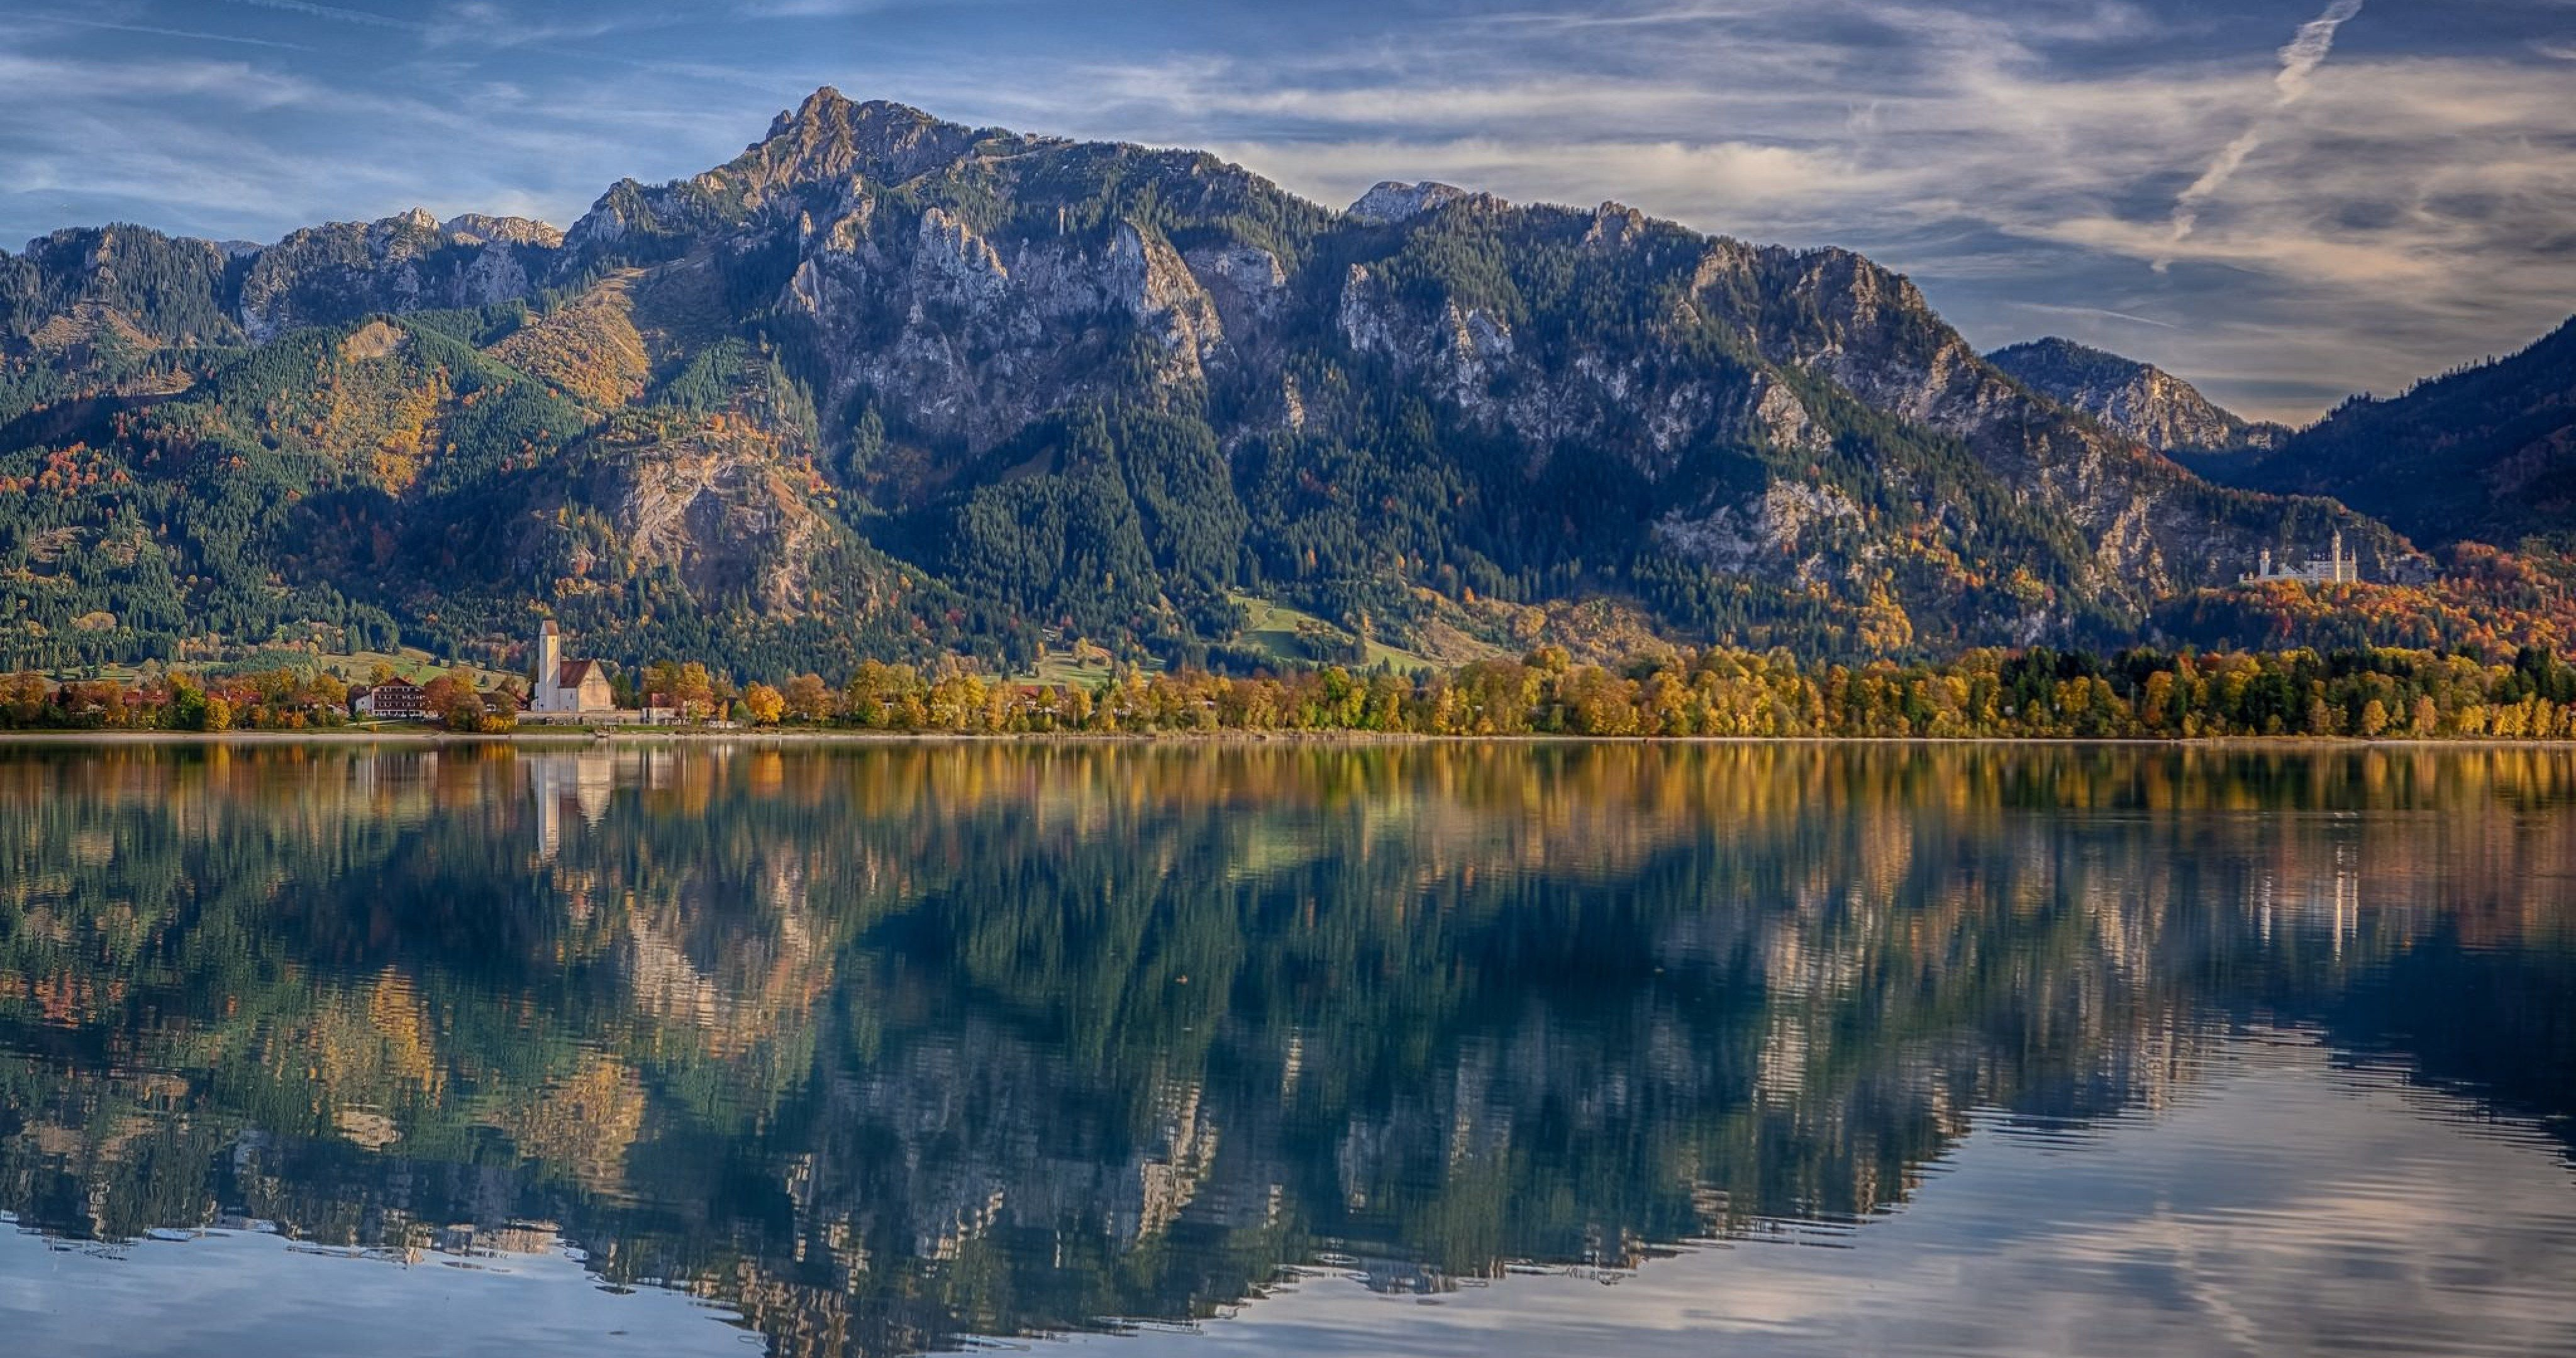 Lake Forggensee Bavaria Germany Wallpaper 4k Ultra Hd Wallpaper Neuschwanstein Castle Germany Nature Wallpaper